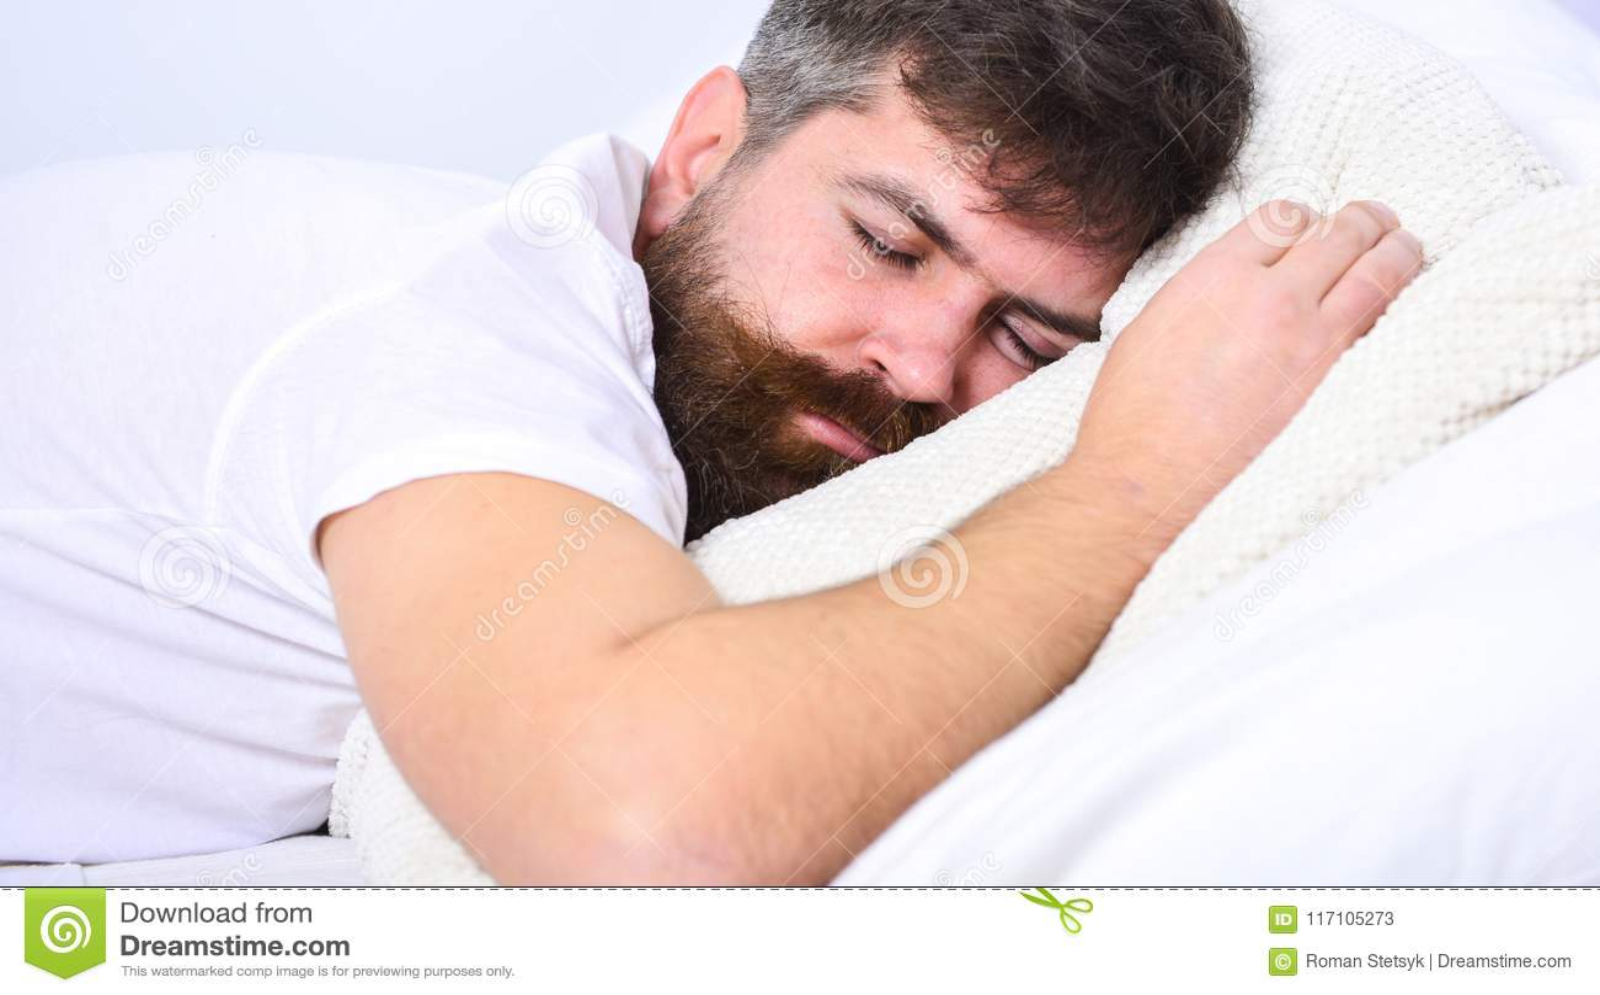 Mens die in overhemd op bed, witte muur op achtergrond leggen Macho met baard en snorslaap, die hebbend dutje, rust ontspannen